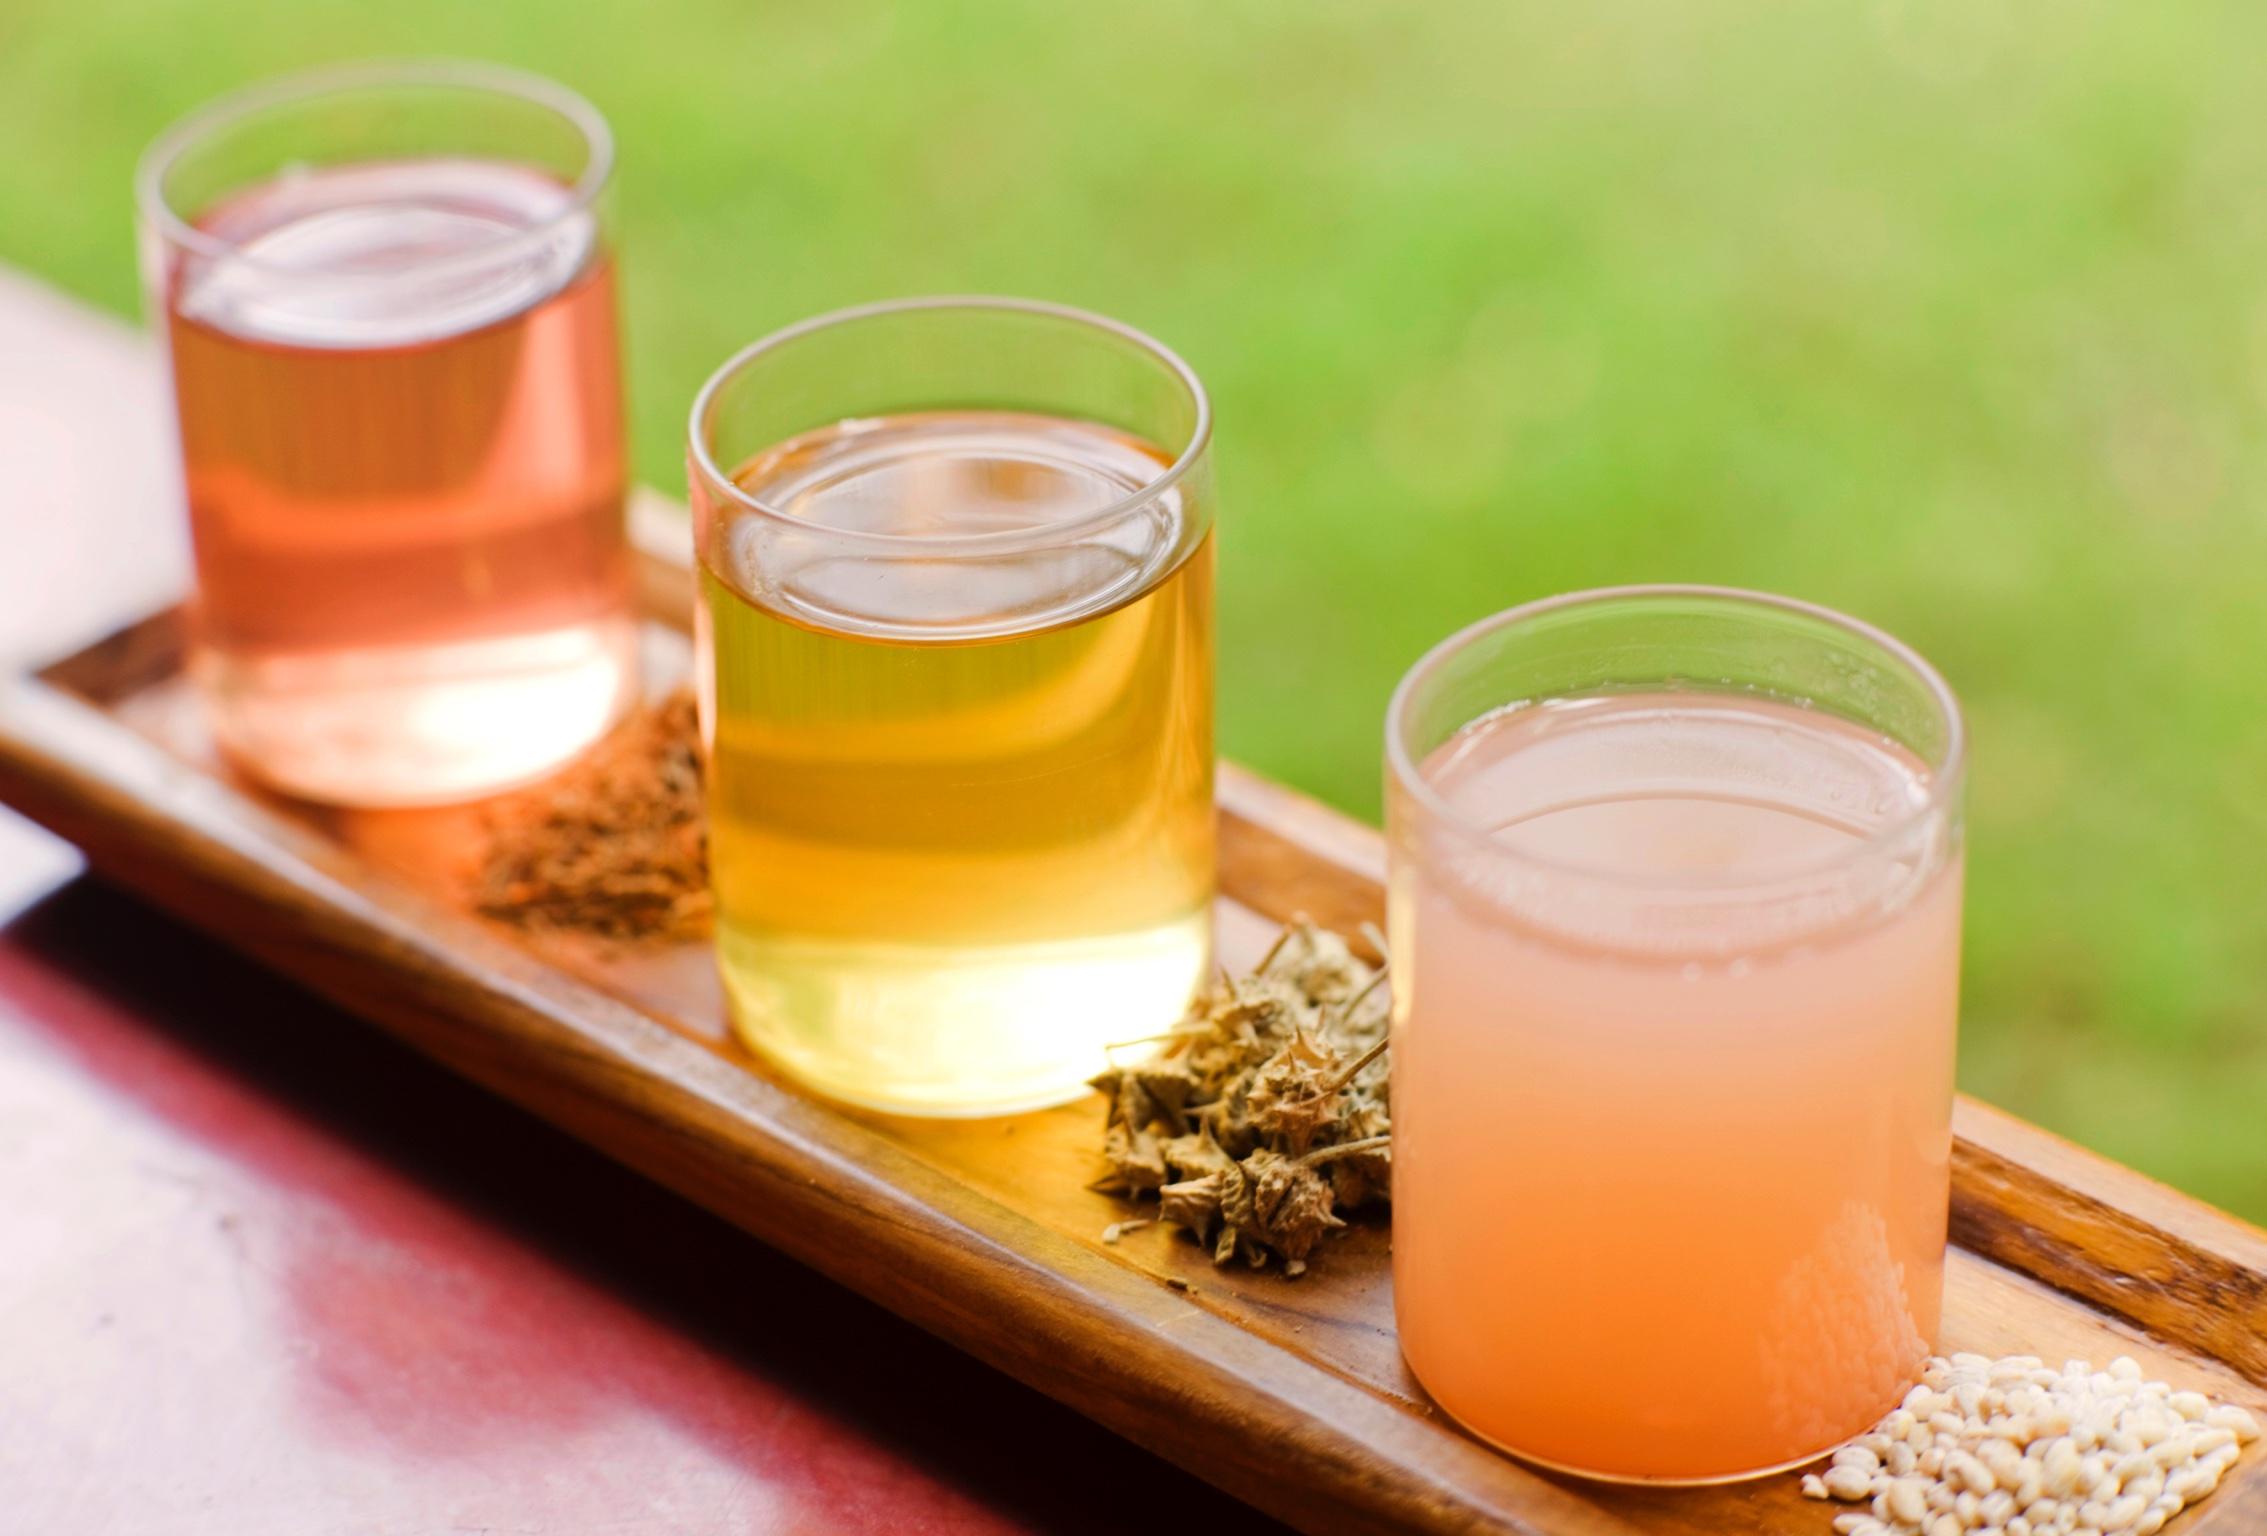 Welcome Drink - 5 (Kairali The Ayurvedic